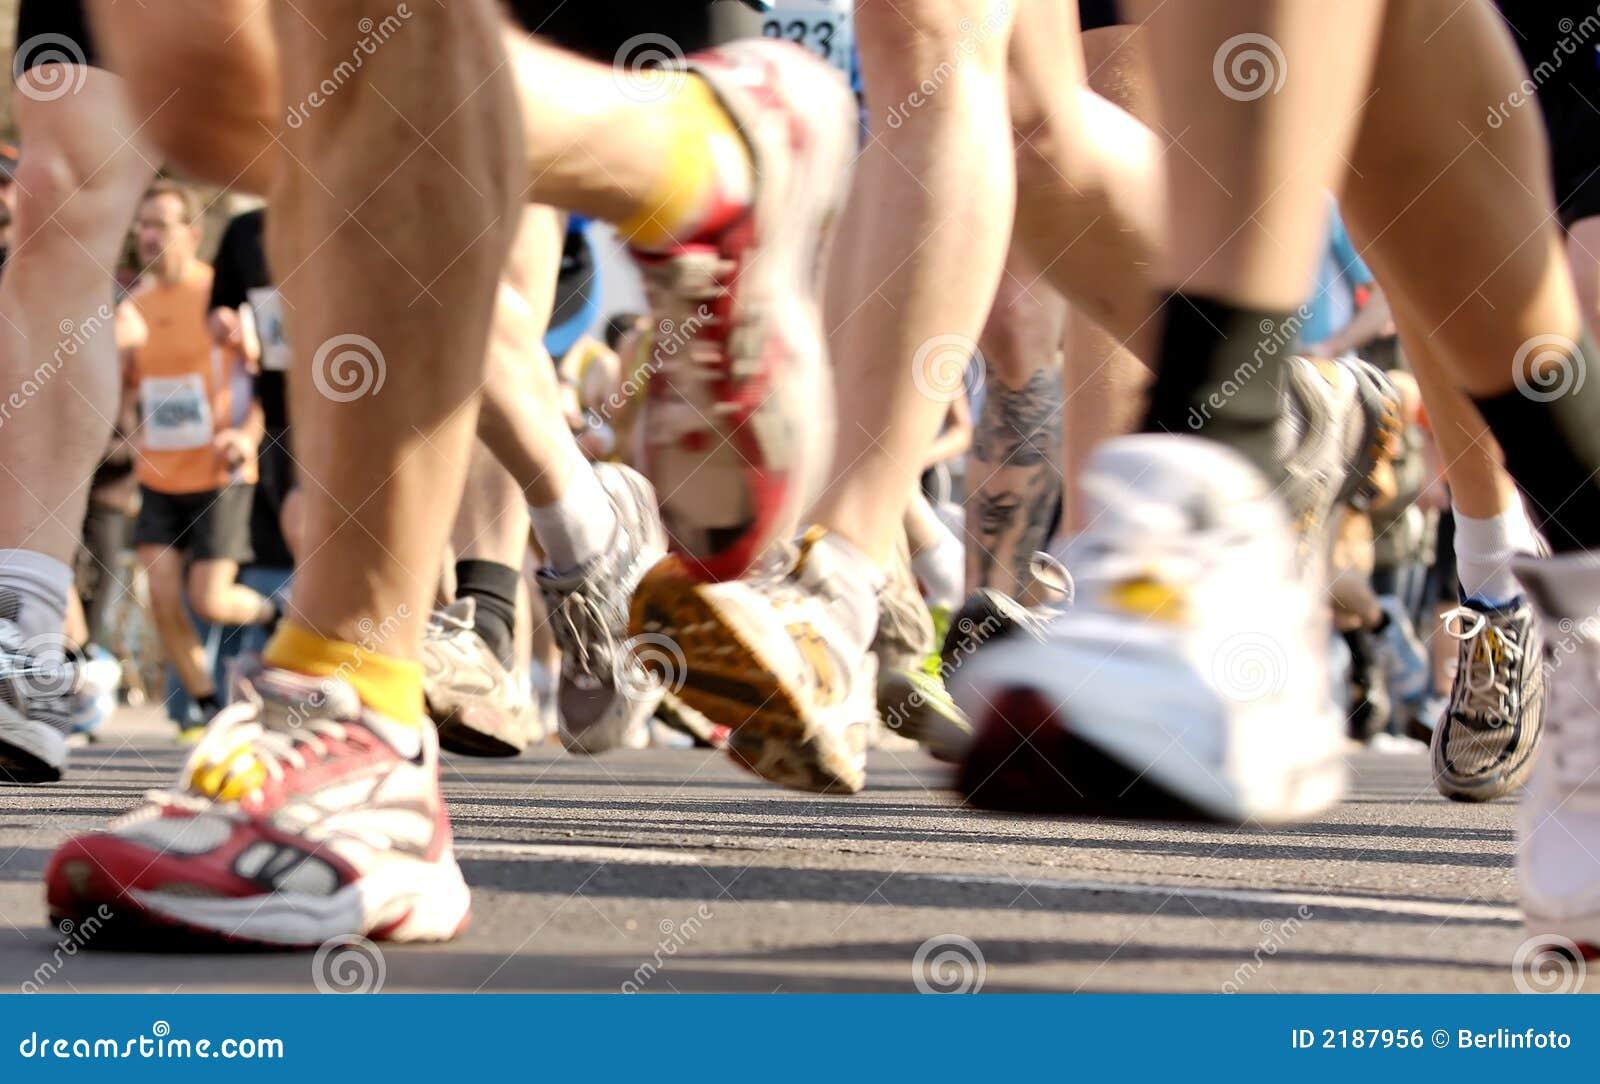 Lets run!